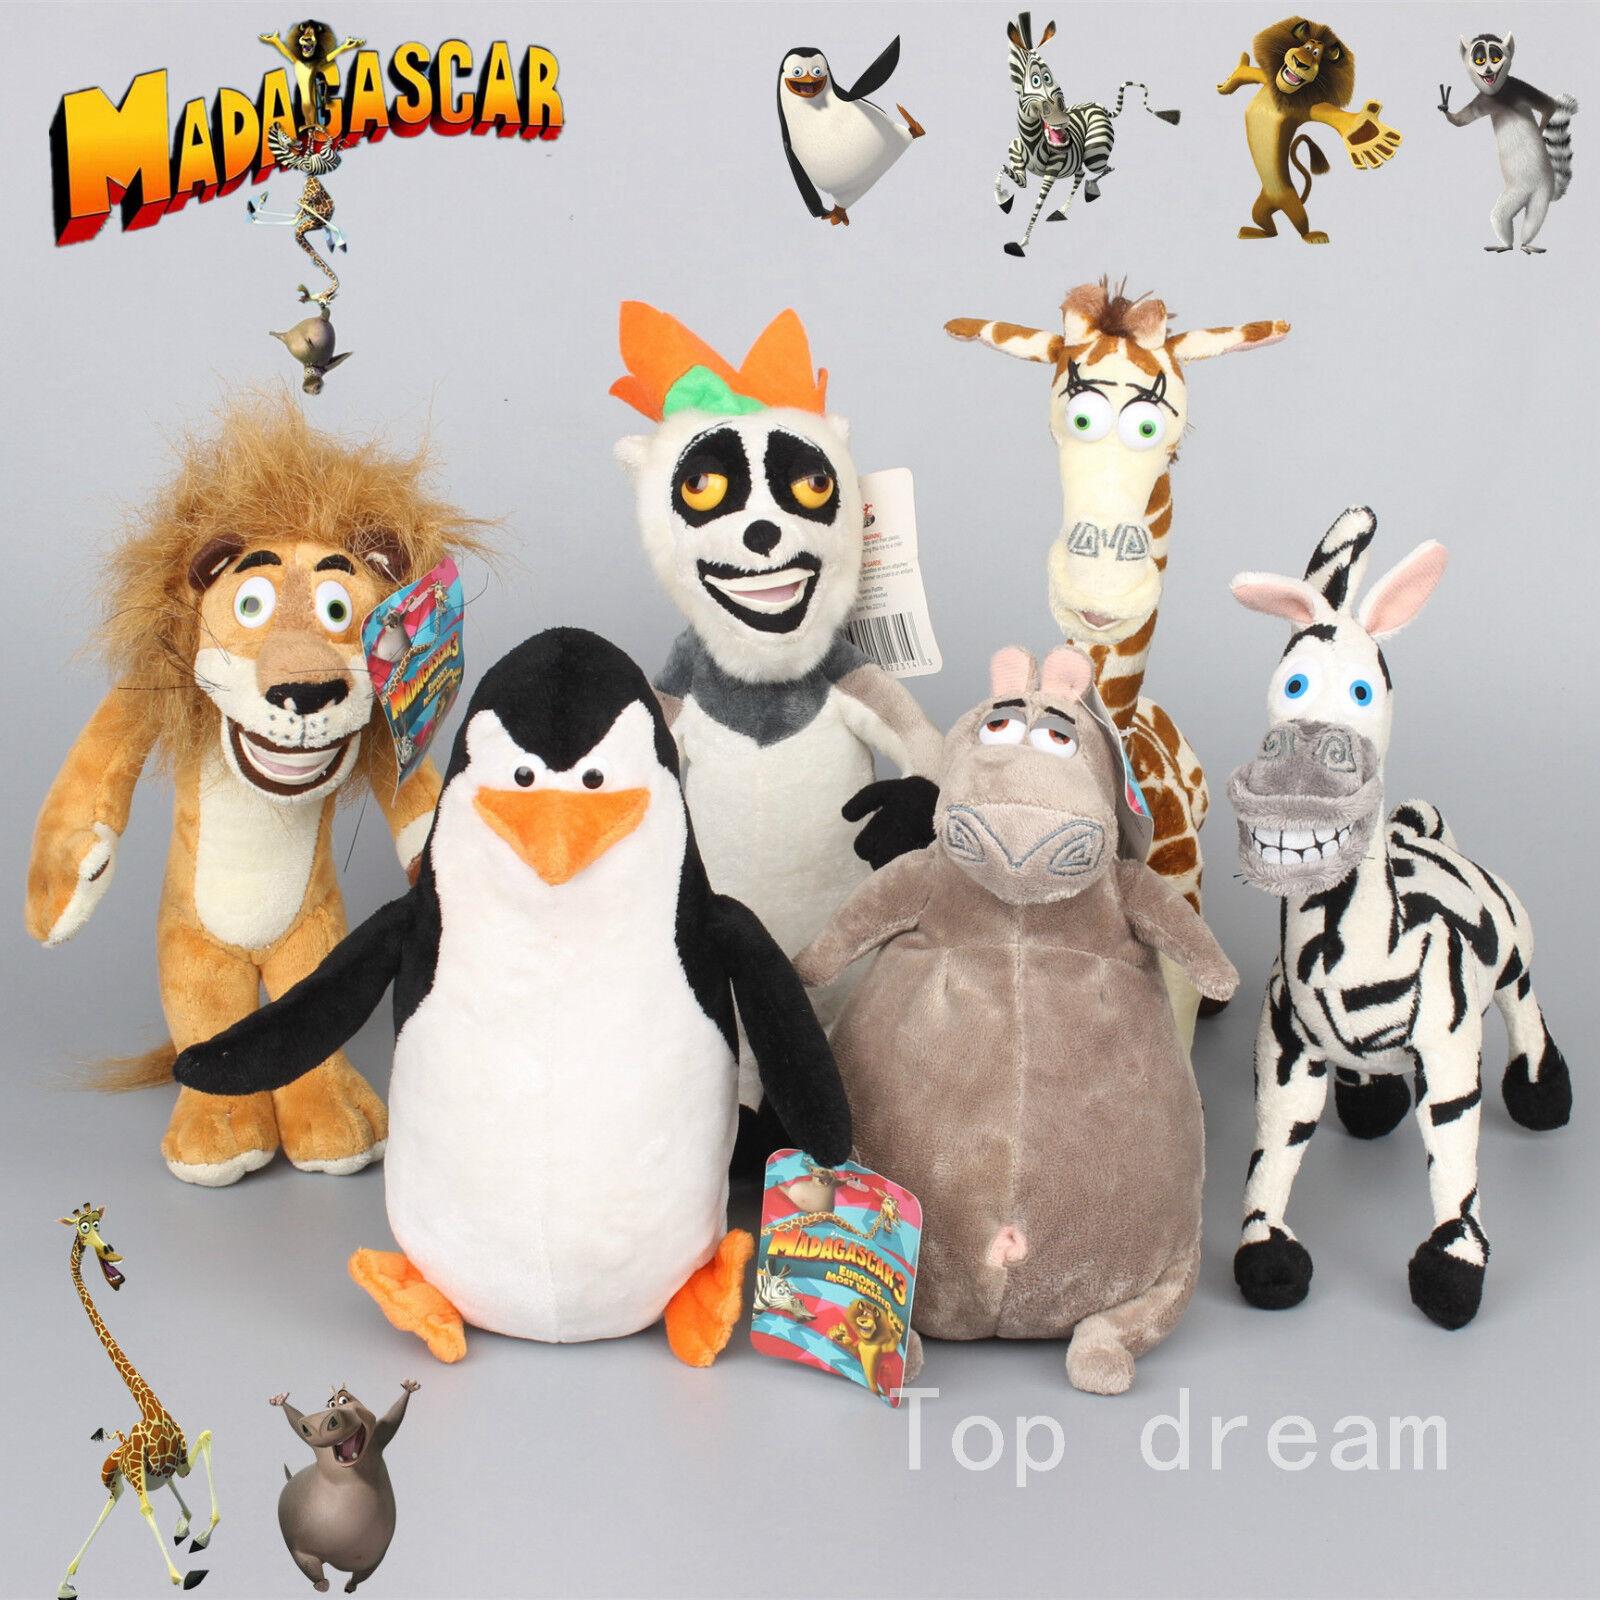 Madagascar Giraffe Melman Penguin Plush Toy Hippo Figurine Zebra Lion xmas doll